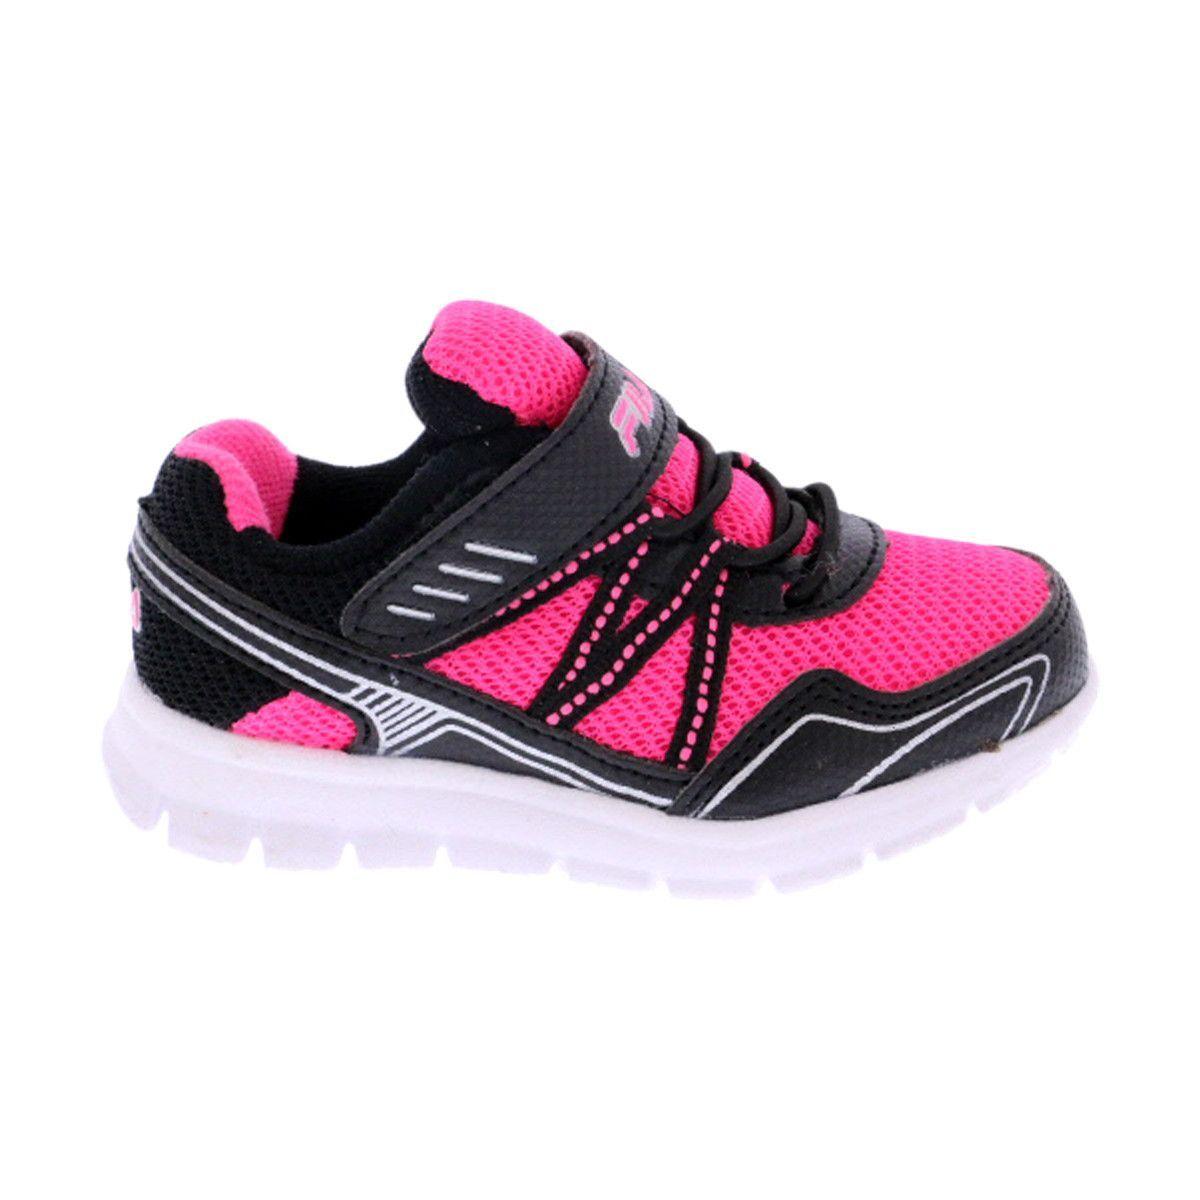 ac7edebb88bd Fila - Girl s Fiction Sneakers (Toddler)- Pink Black